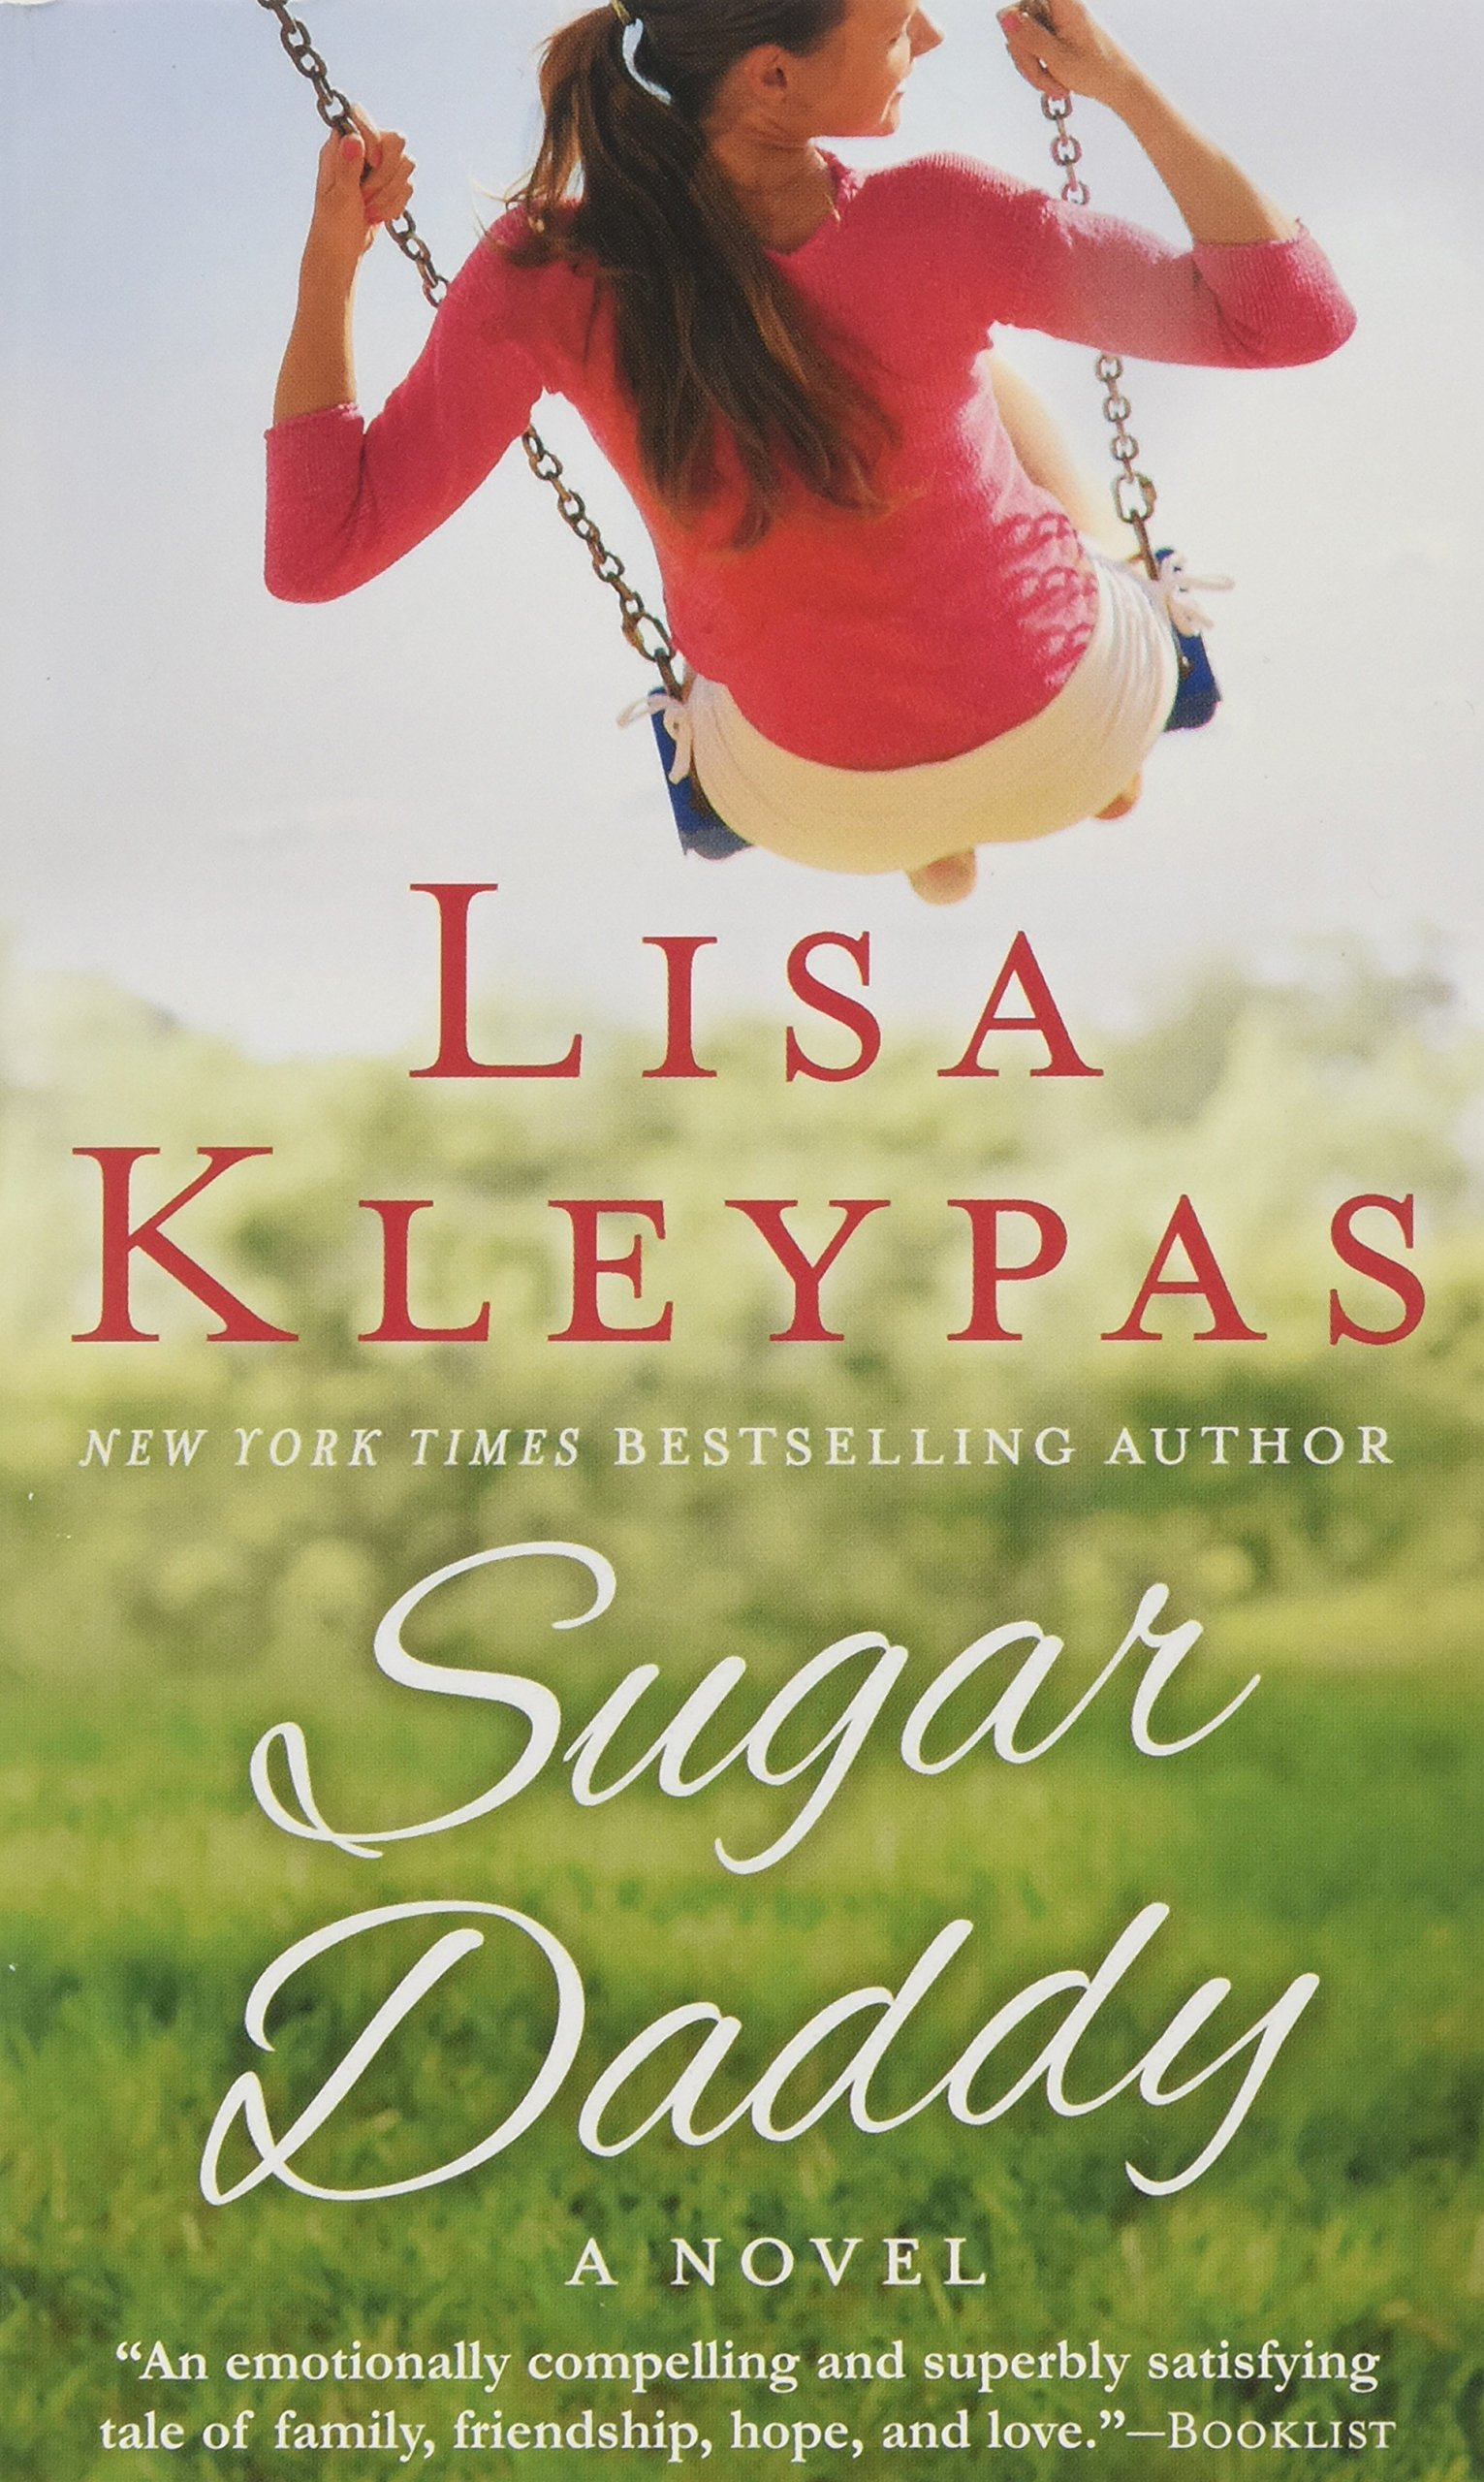 Sugar Daddy (Inglese) Copertina flessibile – 4 mar 2008 Lisa Kleypas St Martins Pr 0312351631 Fiction